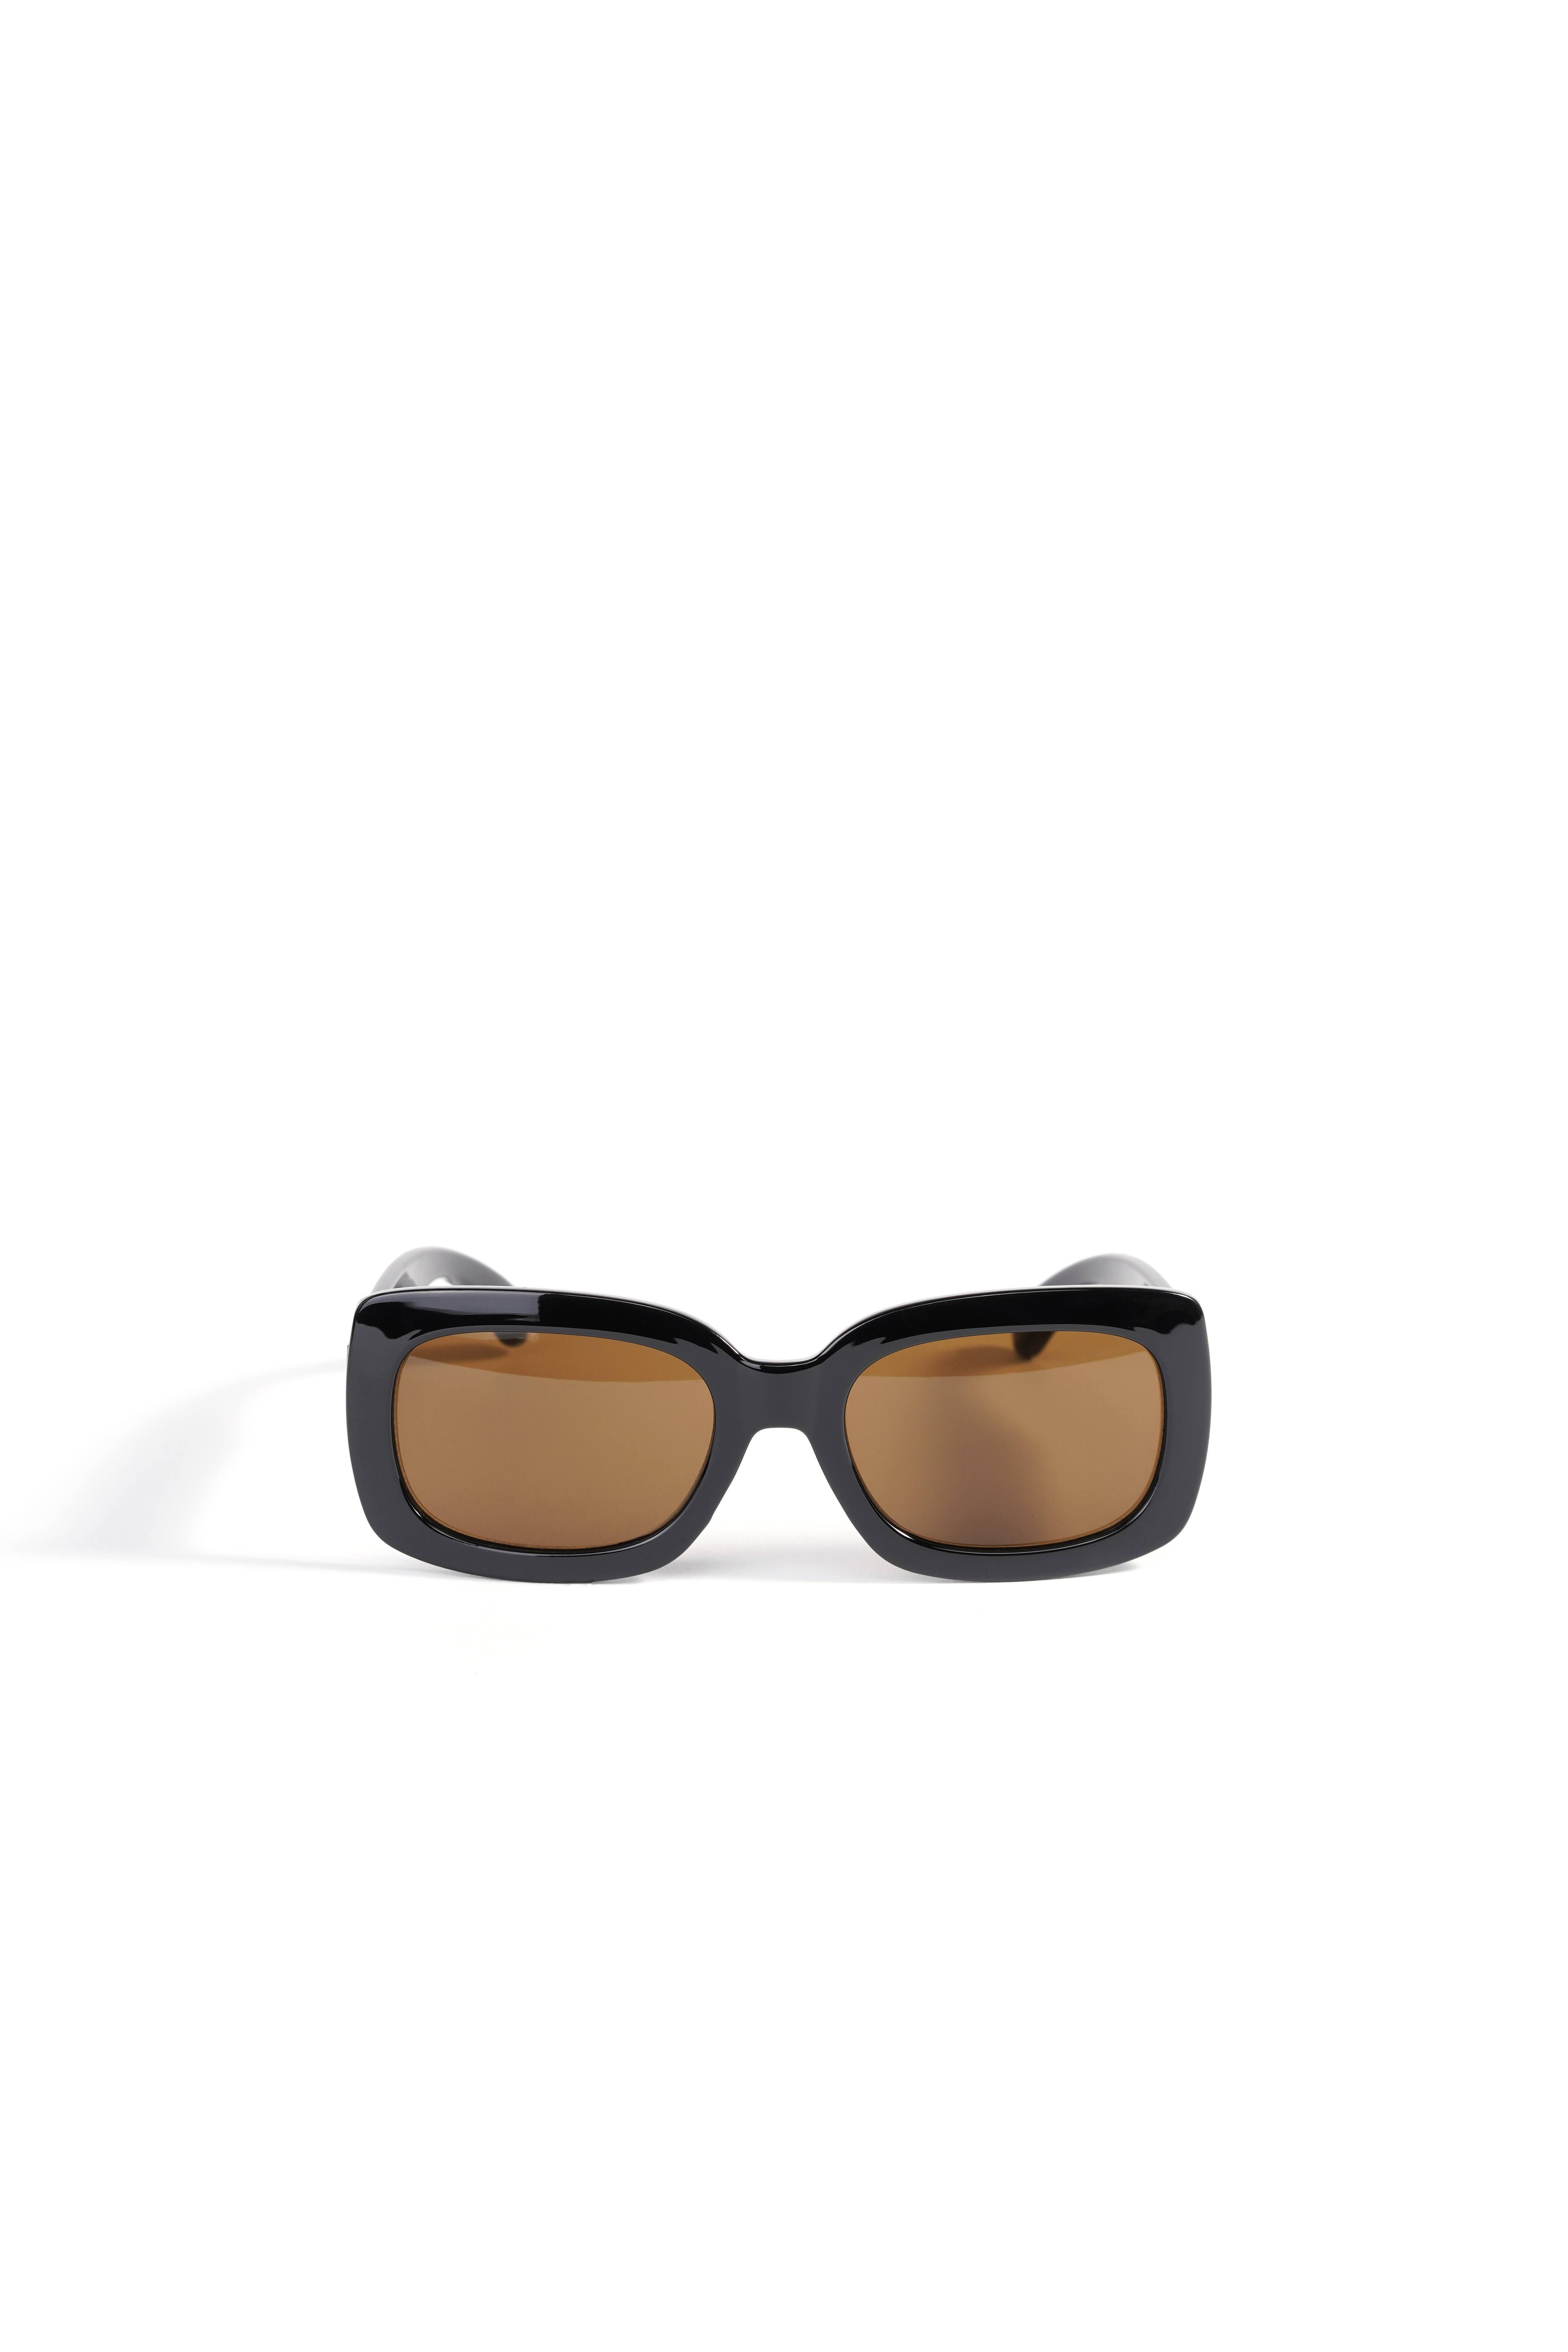 Очки солнцезащитные LIME Солнцезащитные очки очки солнцезащитные jack